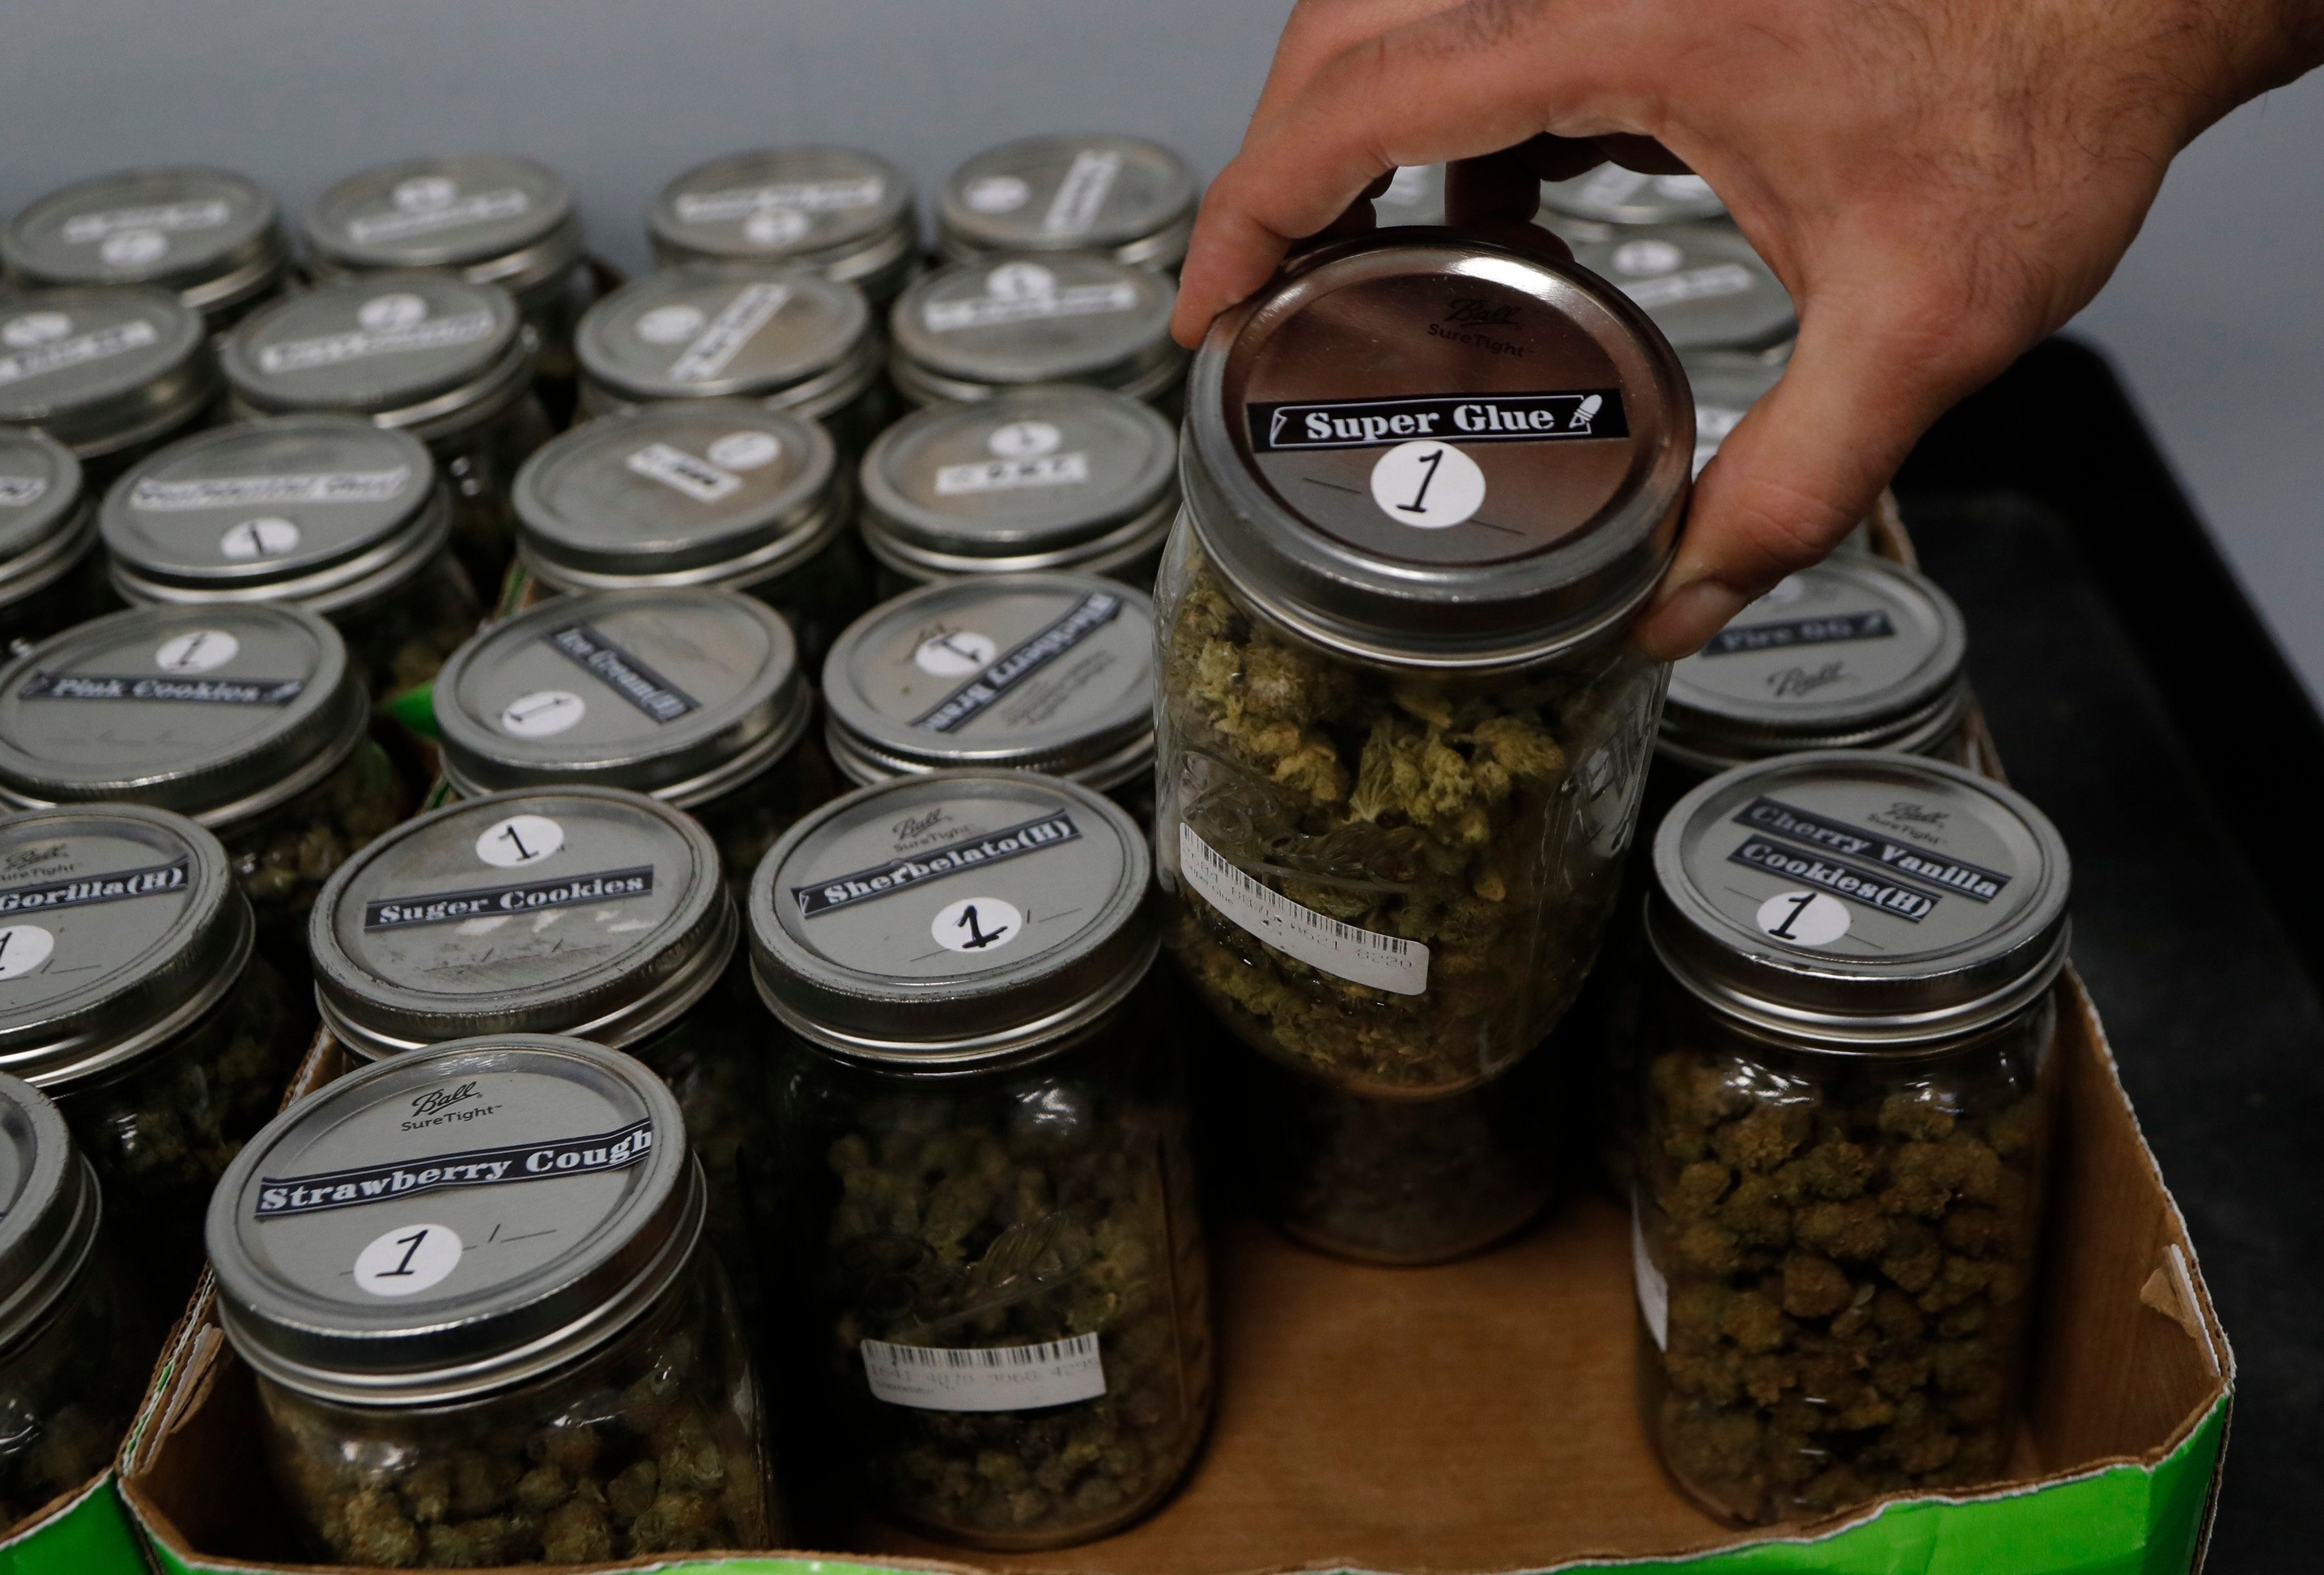 An attendant holds a mason jar of marijuana at a dispensary in Detroit, Michigan, where recreational marijuana has been legal